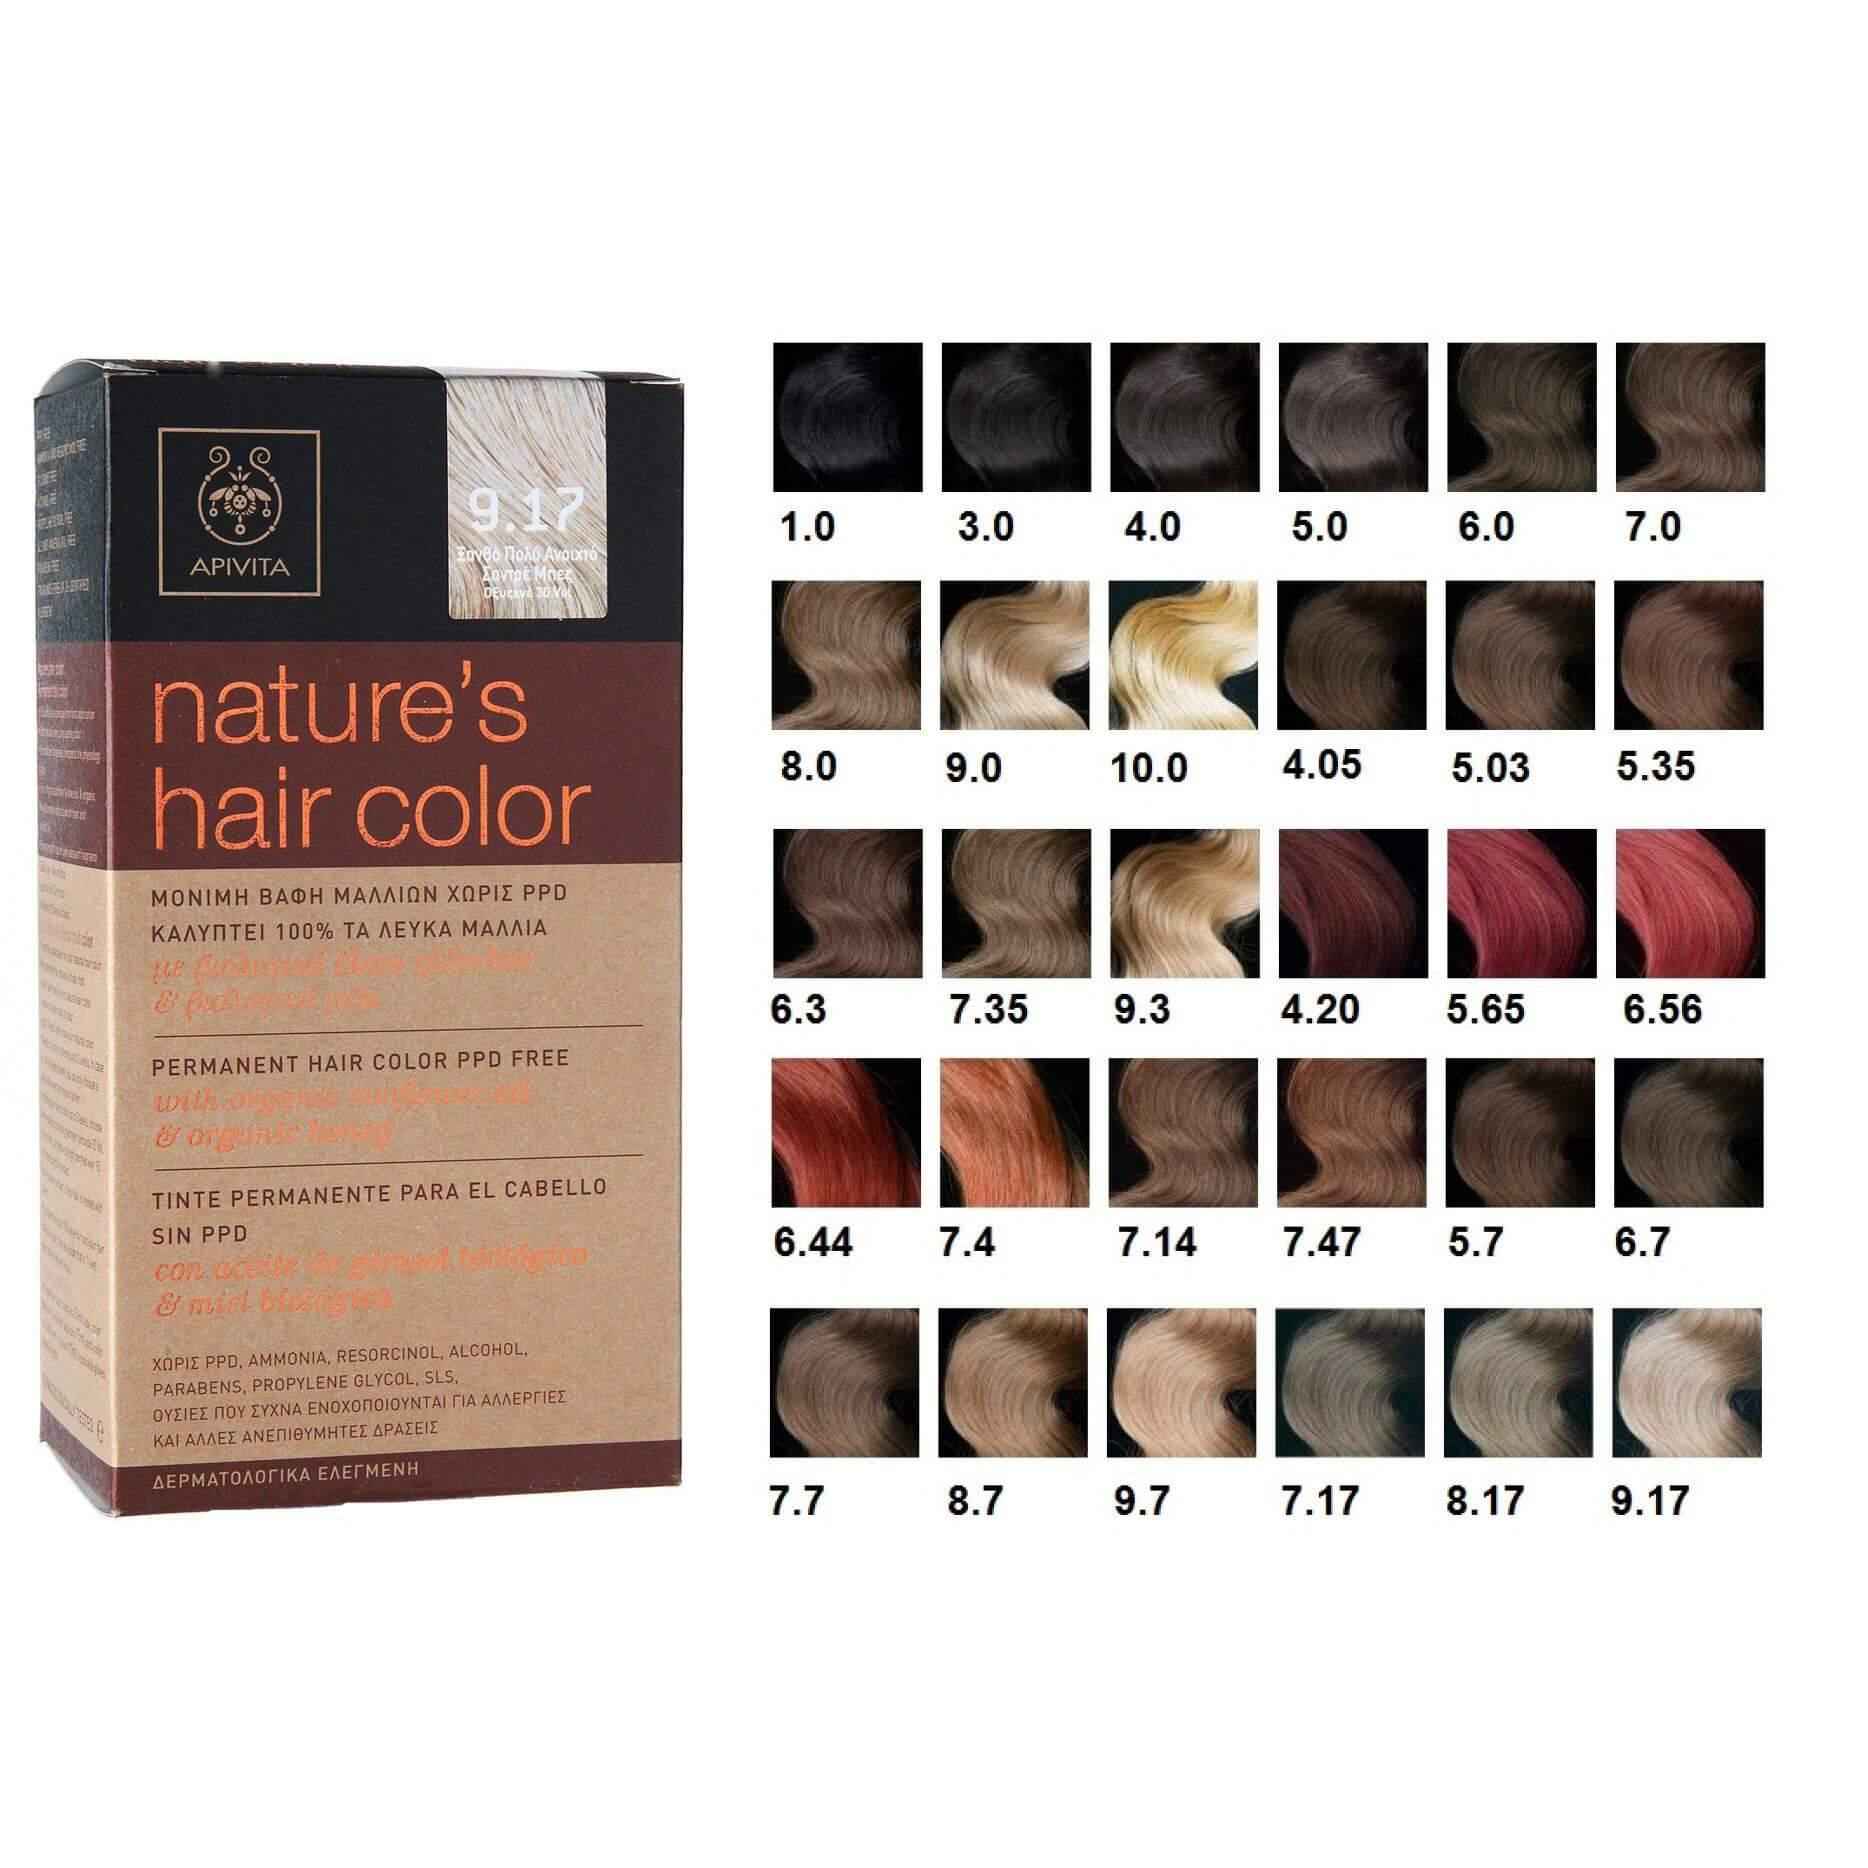 Apivita Βαφές Μαλλιών Natures Hair Color Με Μέλι & Ηλίανθο – 4.0 Καστανό